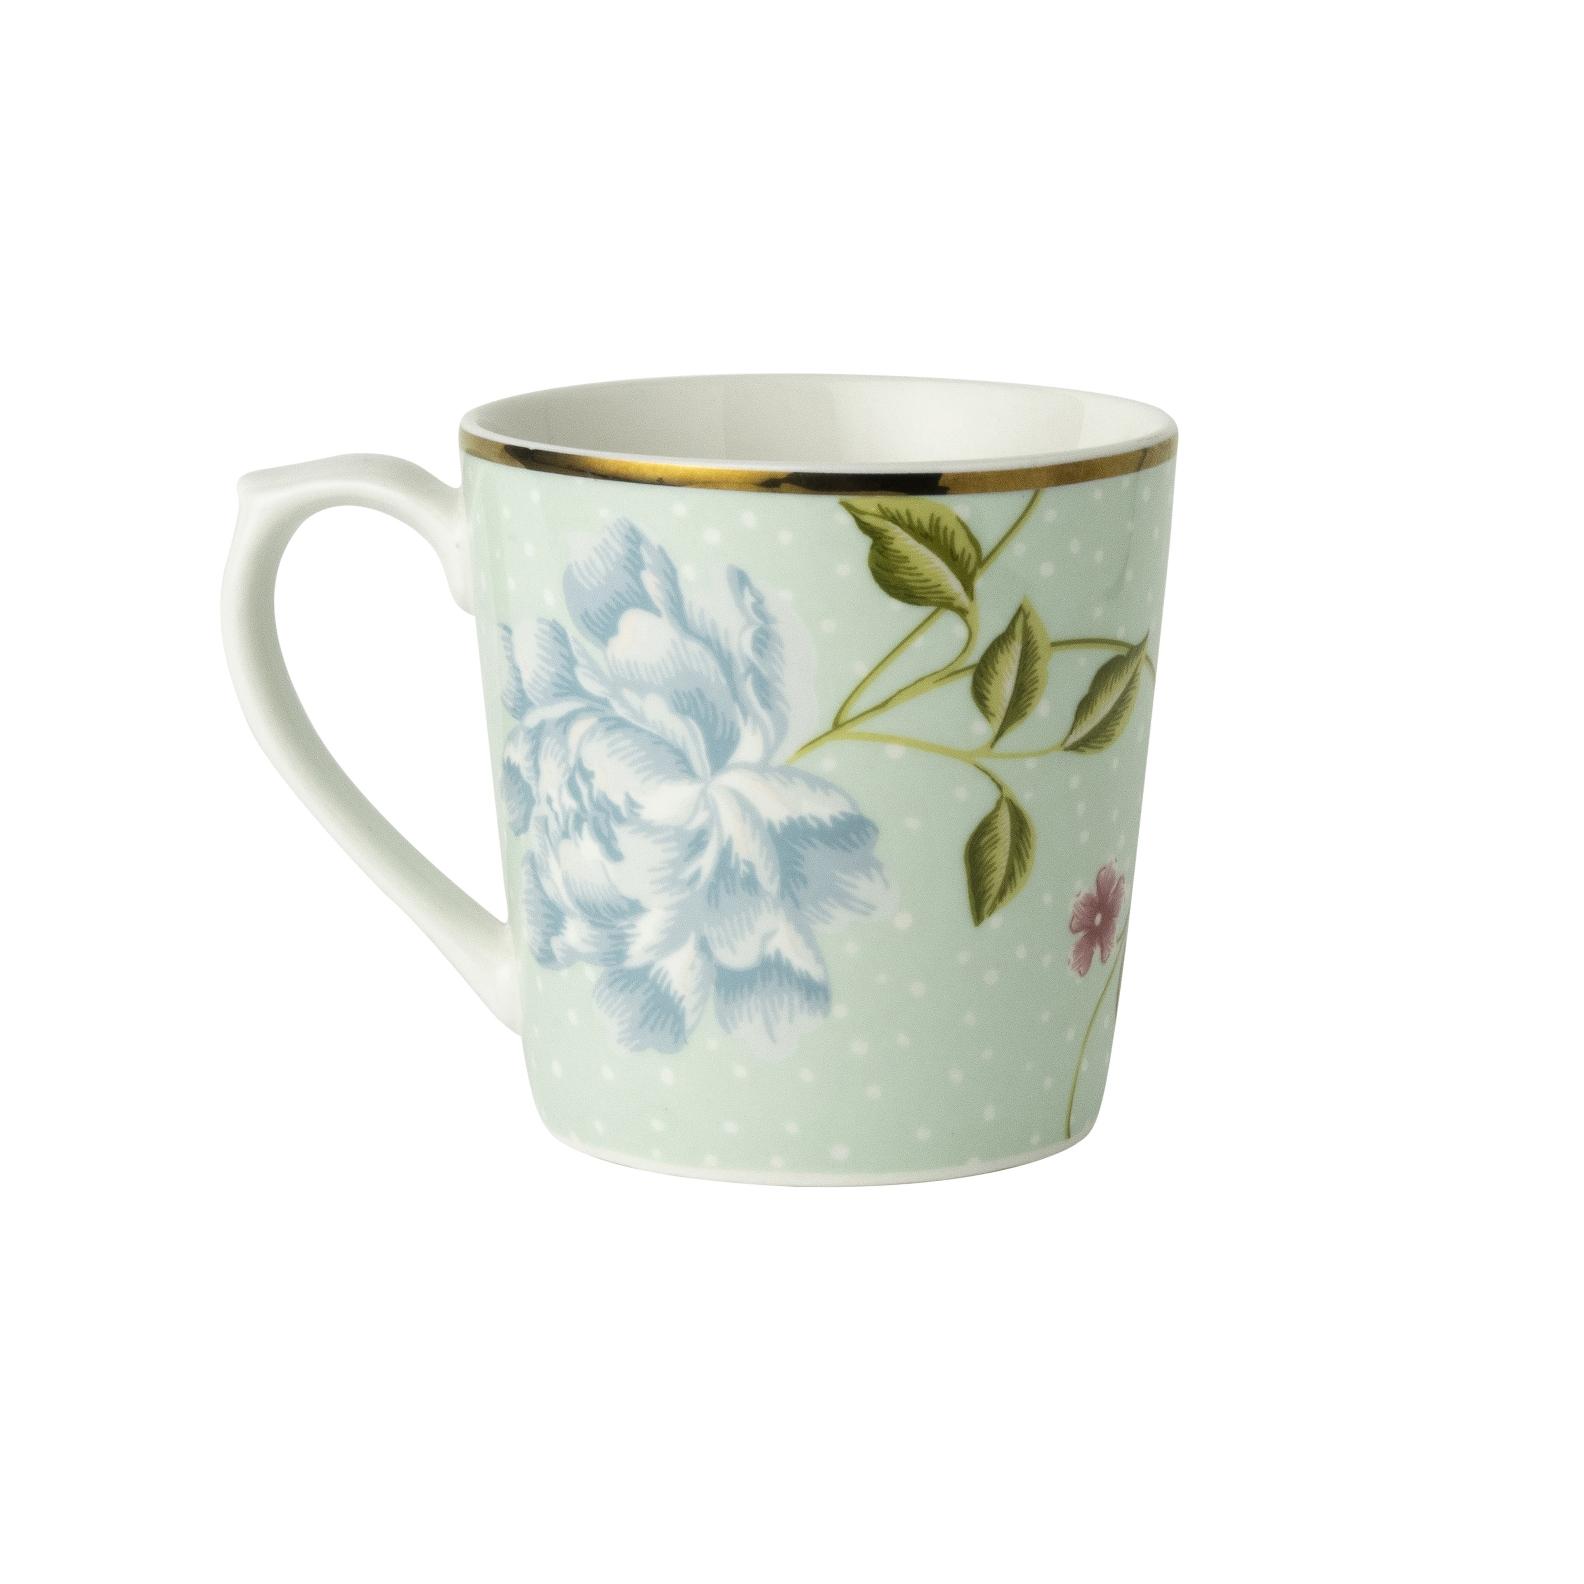 "Онлайн каталог PROMENU: Кружка ""Цветы"" Laura Ashley HERITAGE, объем 0,35 л, мятный с цветами                                   180422"